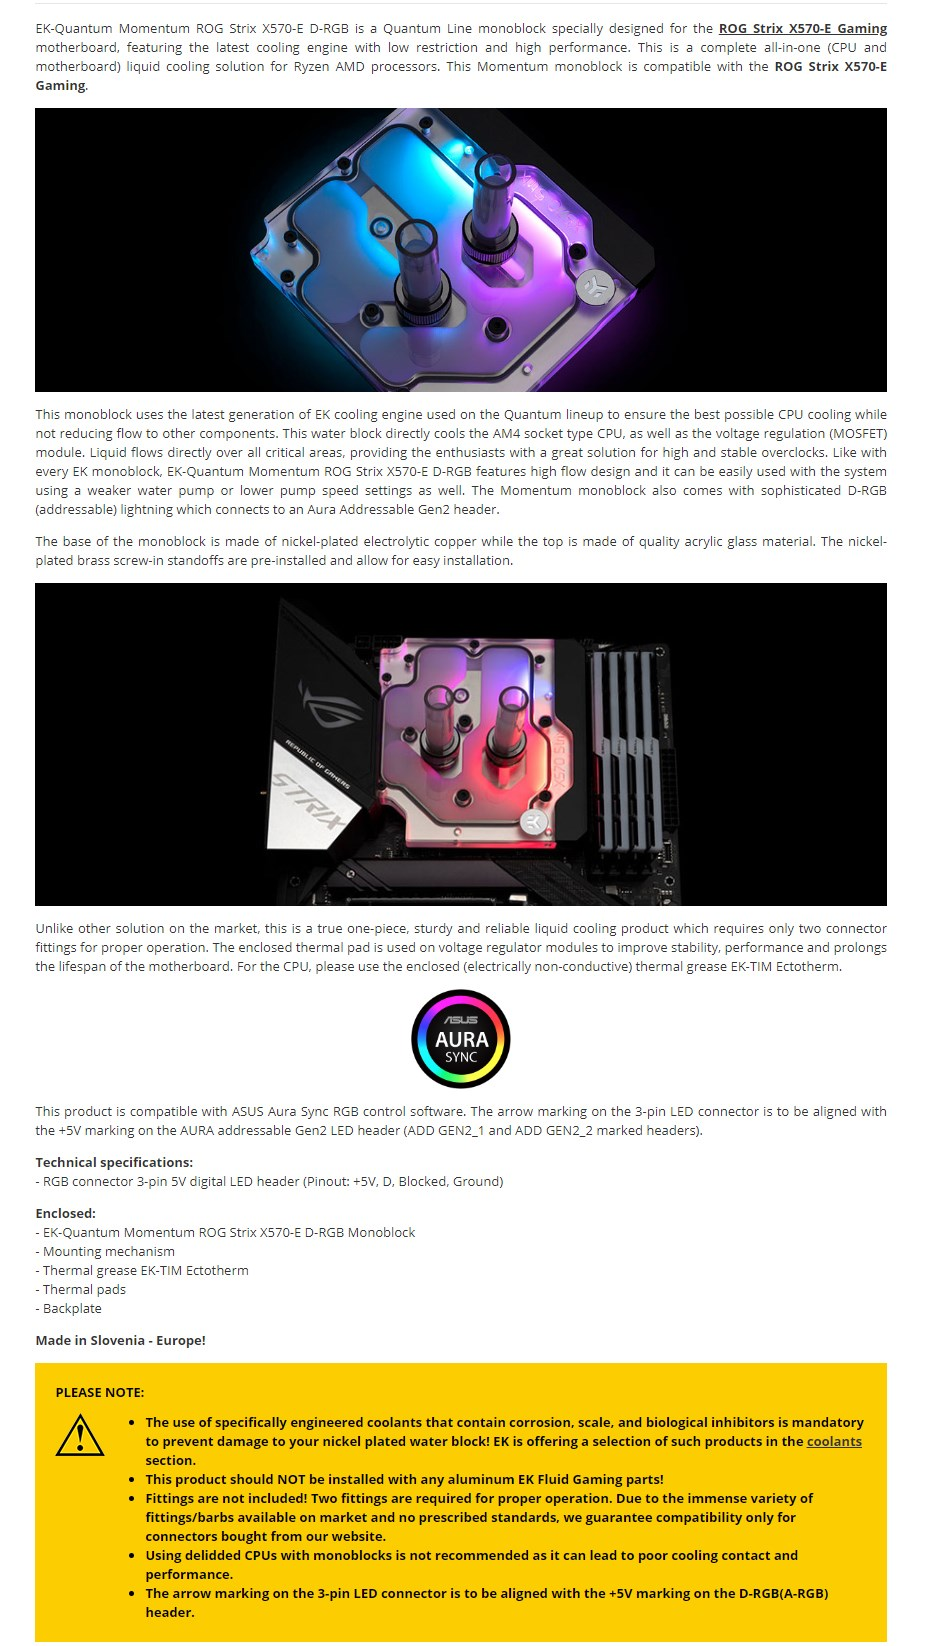 EKWB EK-Quantum Momentum ROG Strix X570-E D-RGB Plexi Monoblock - Overview 1